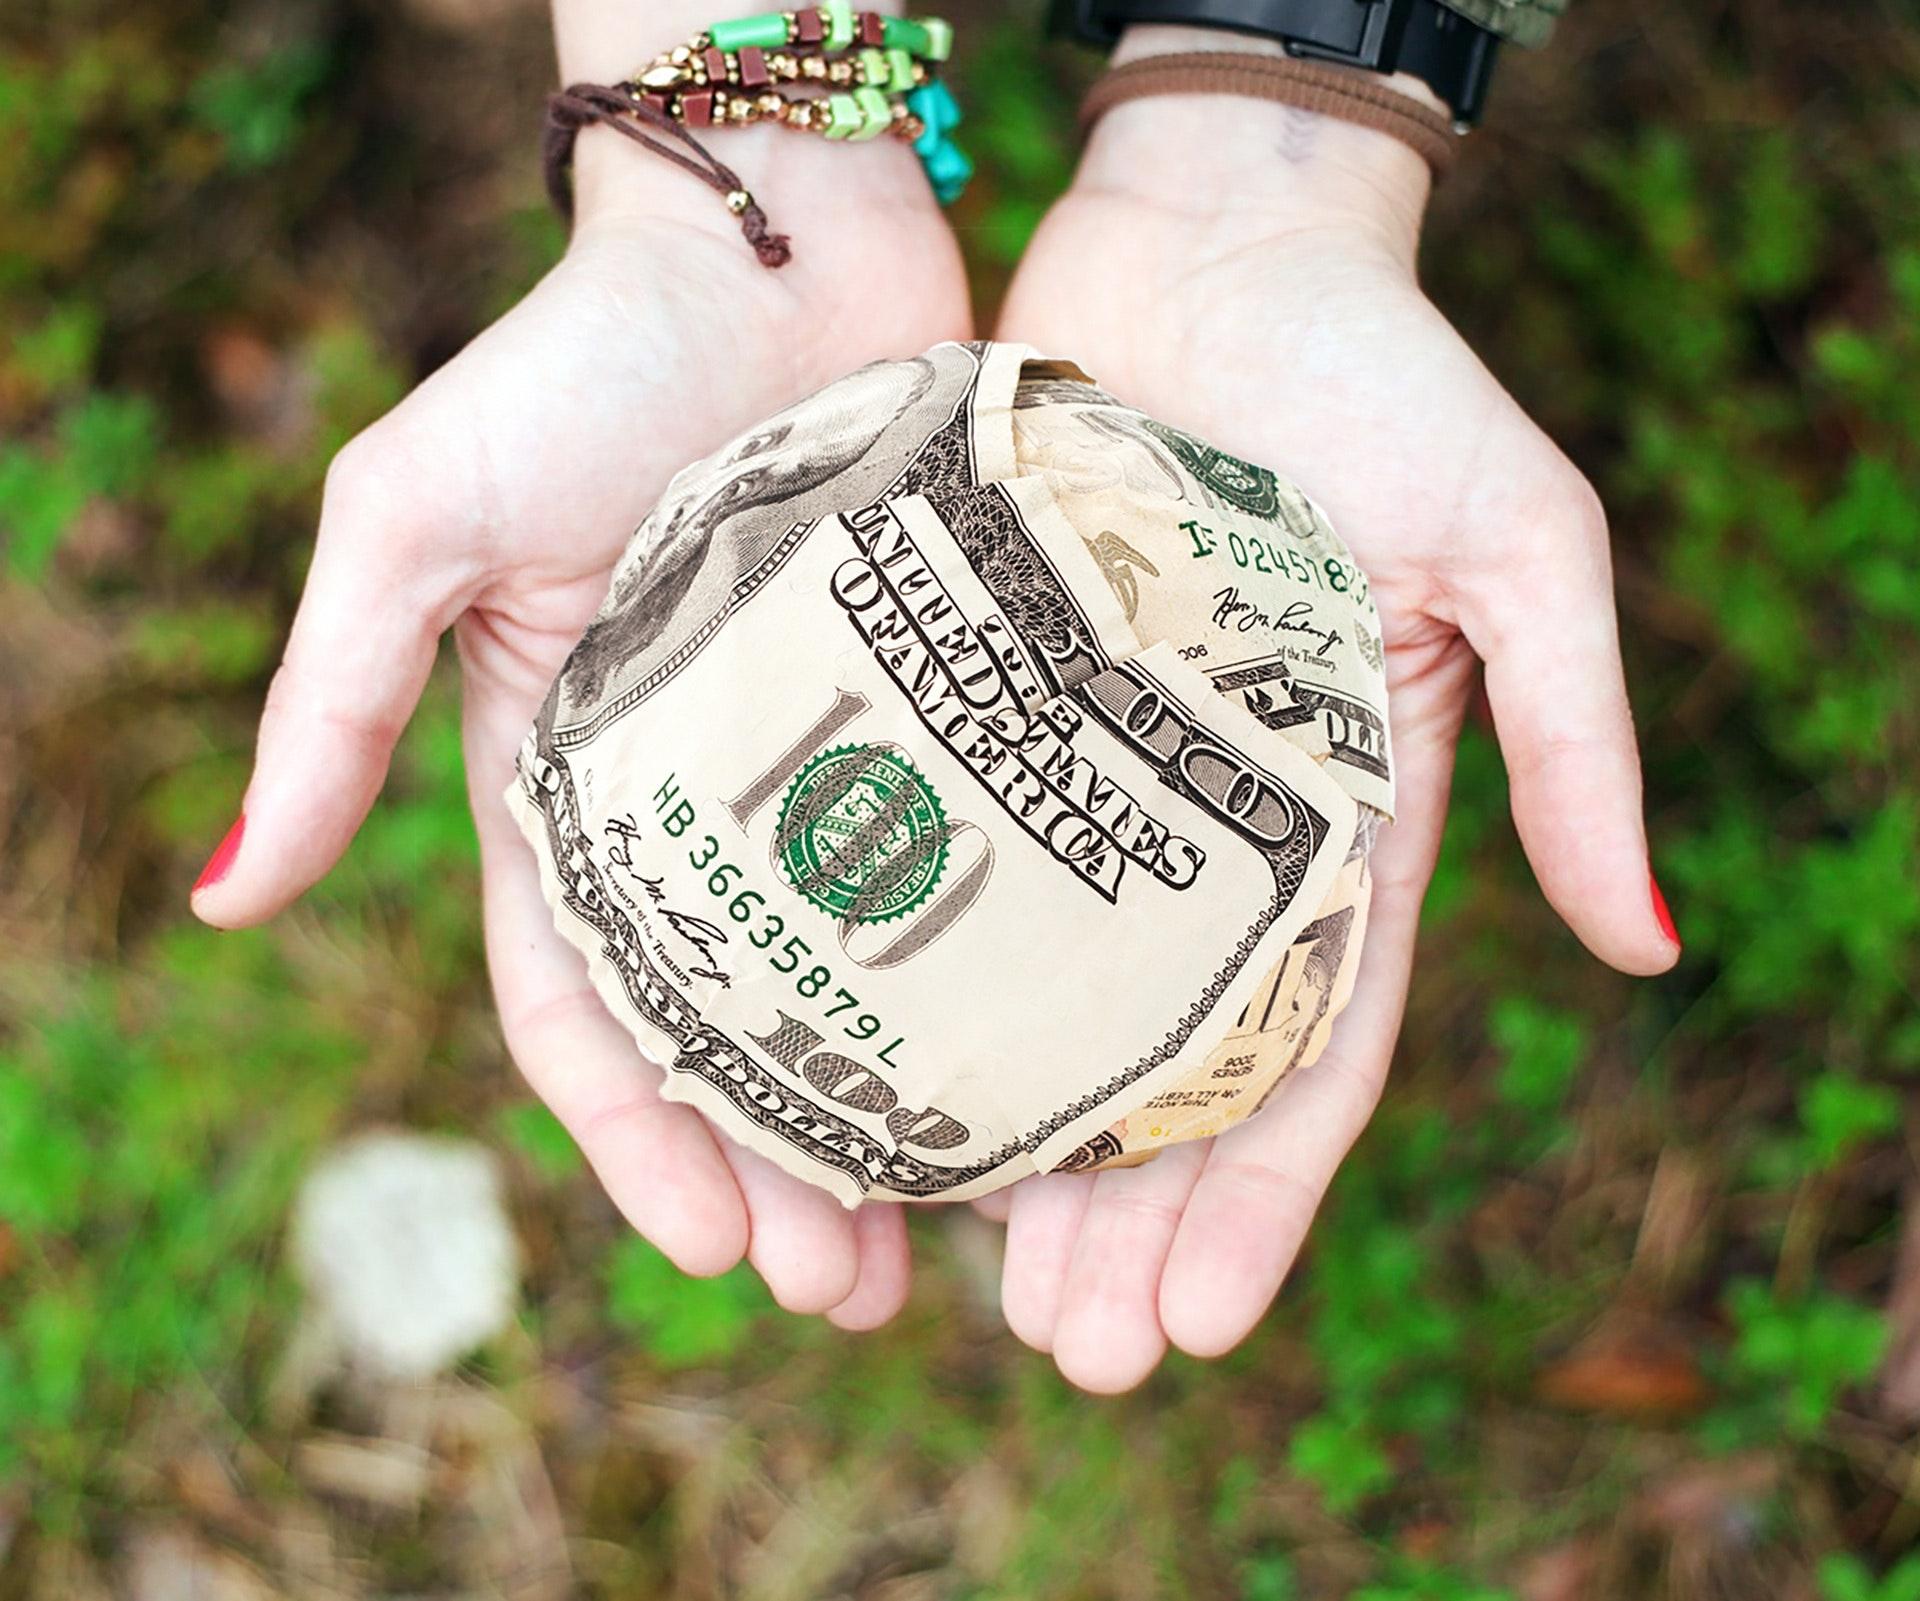 money - bracelets-cash-crumpled-271168.jpg